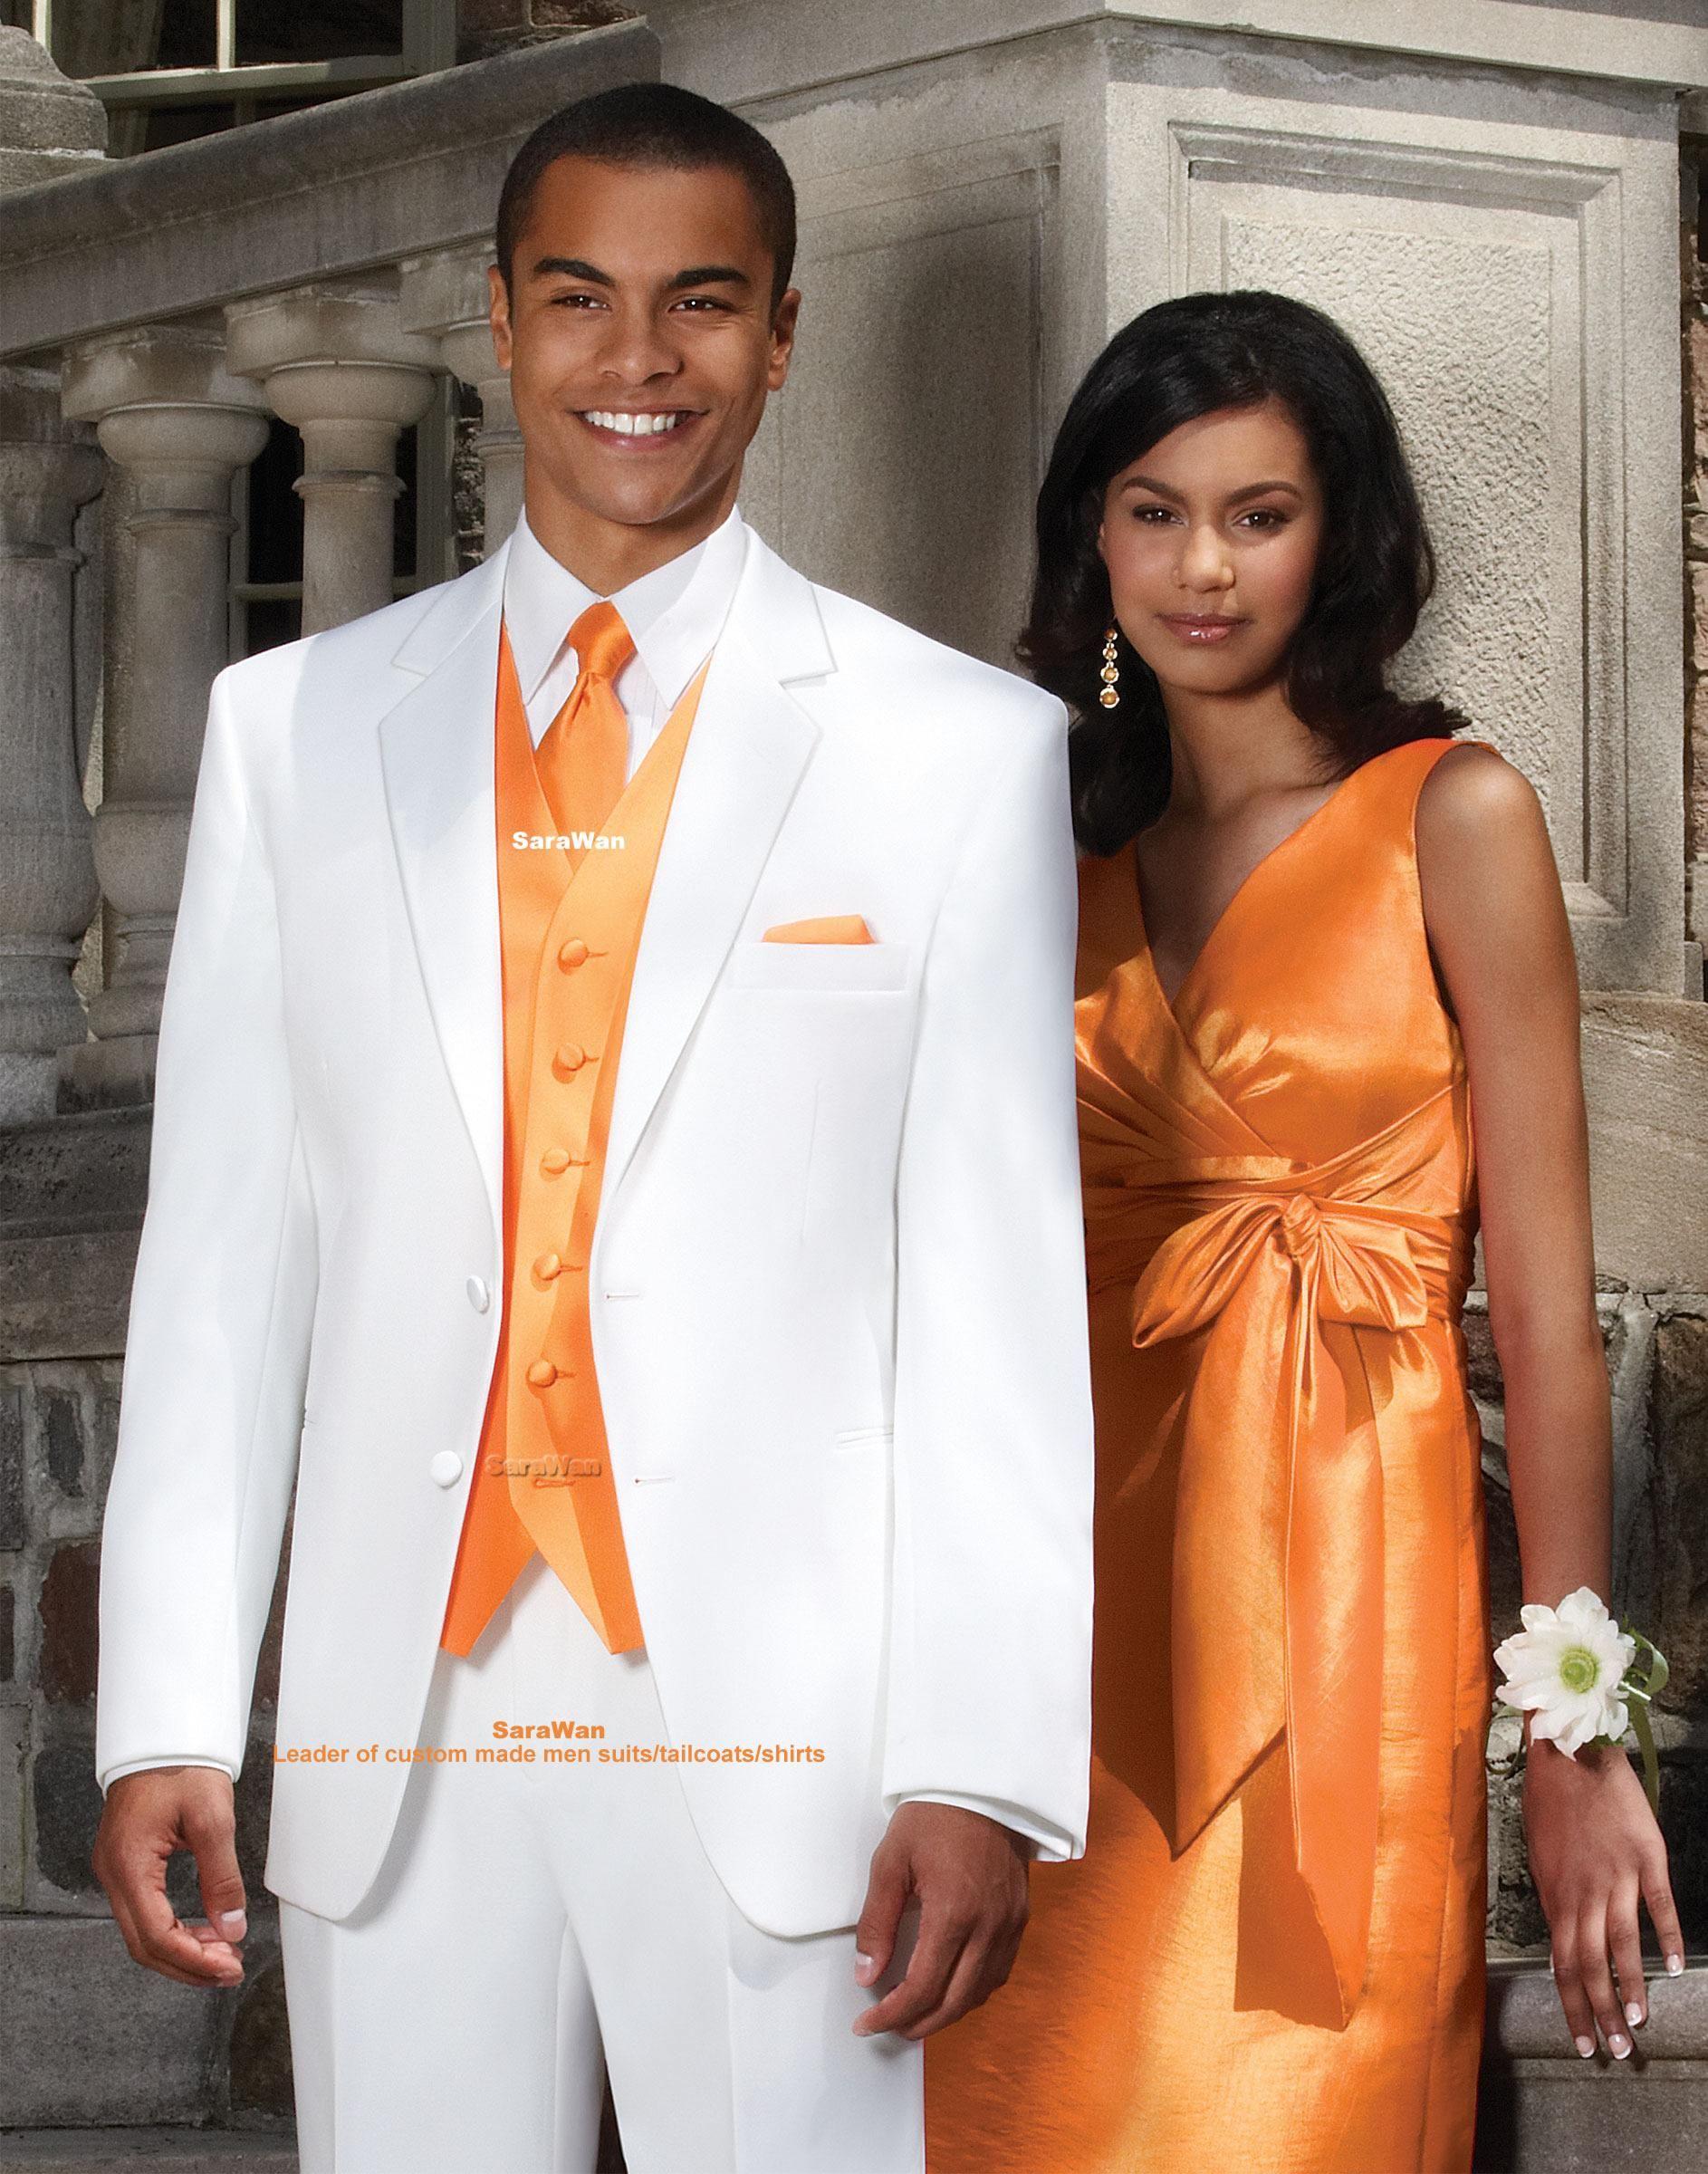 Custom Made Groom Tuxedo, Bespoke White suits with orange vest ...